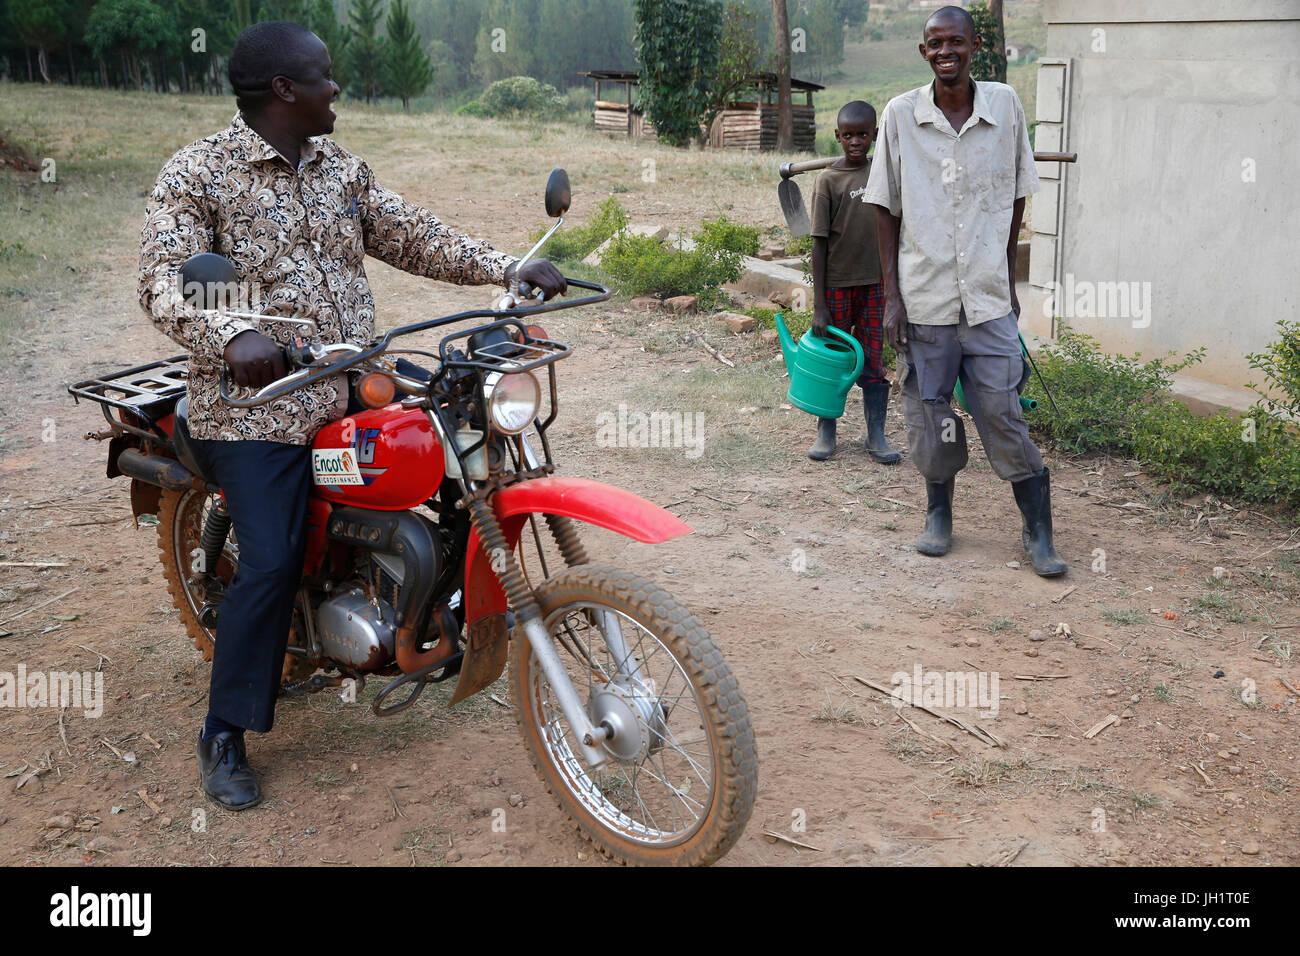 ENCOT microfinance branch manager Francis Buguma visiting farmer client Apollo Byarunga. Uganda. - Stock Image